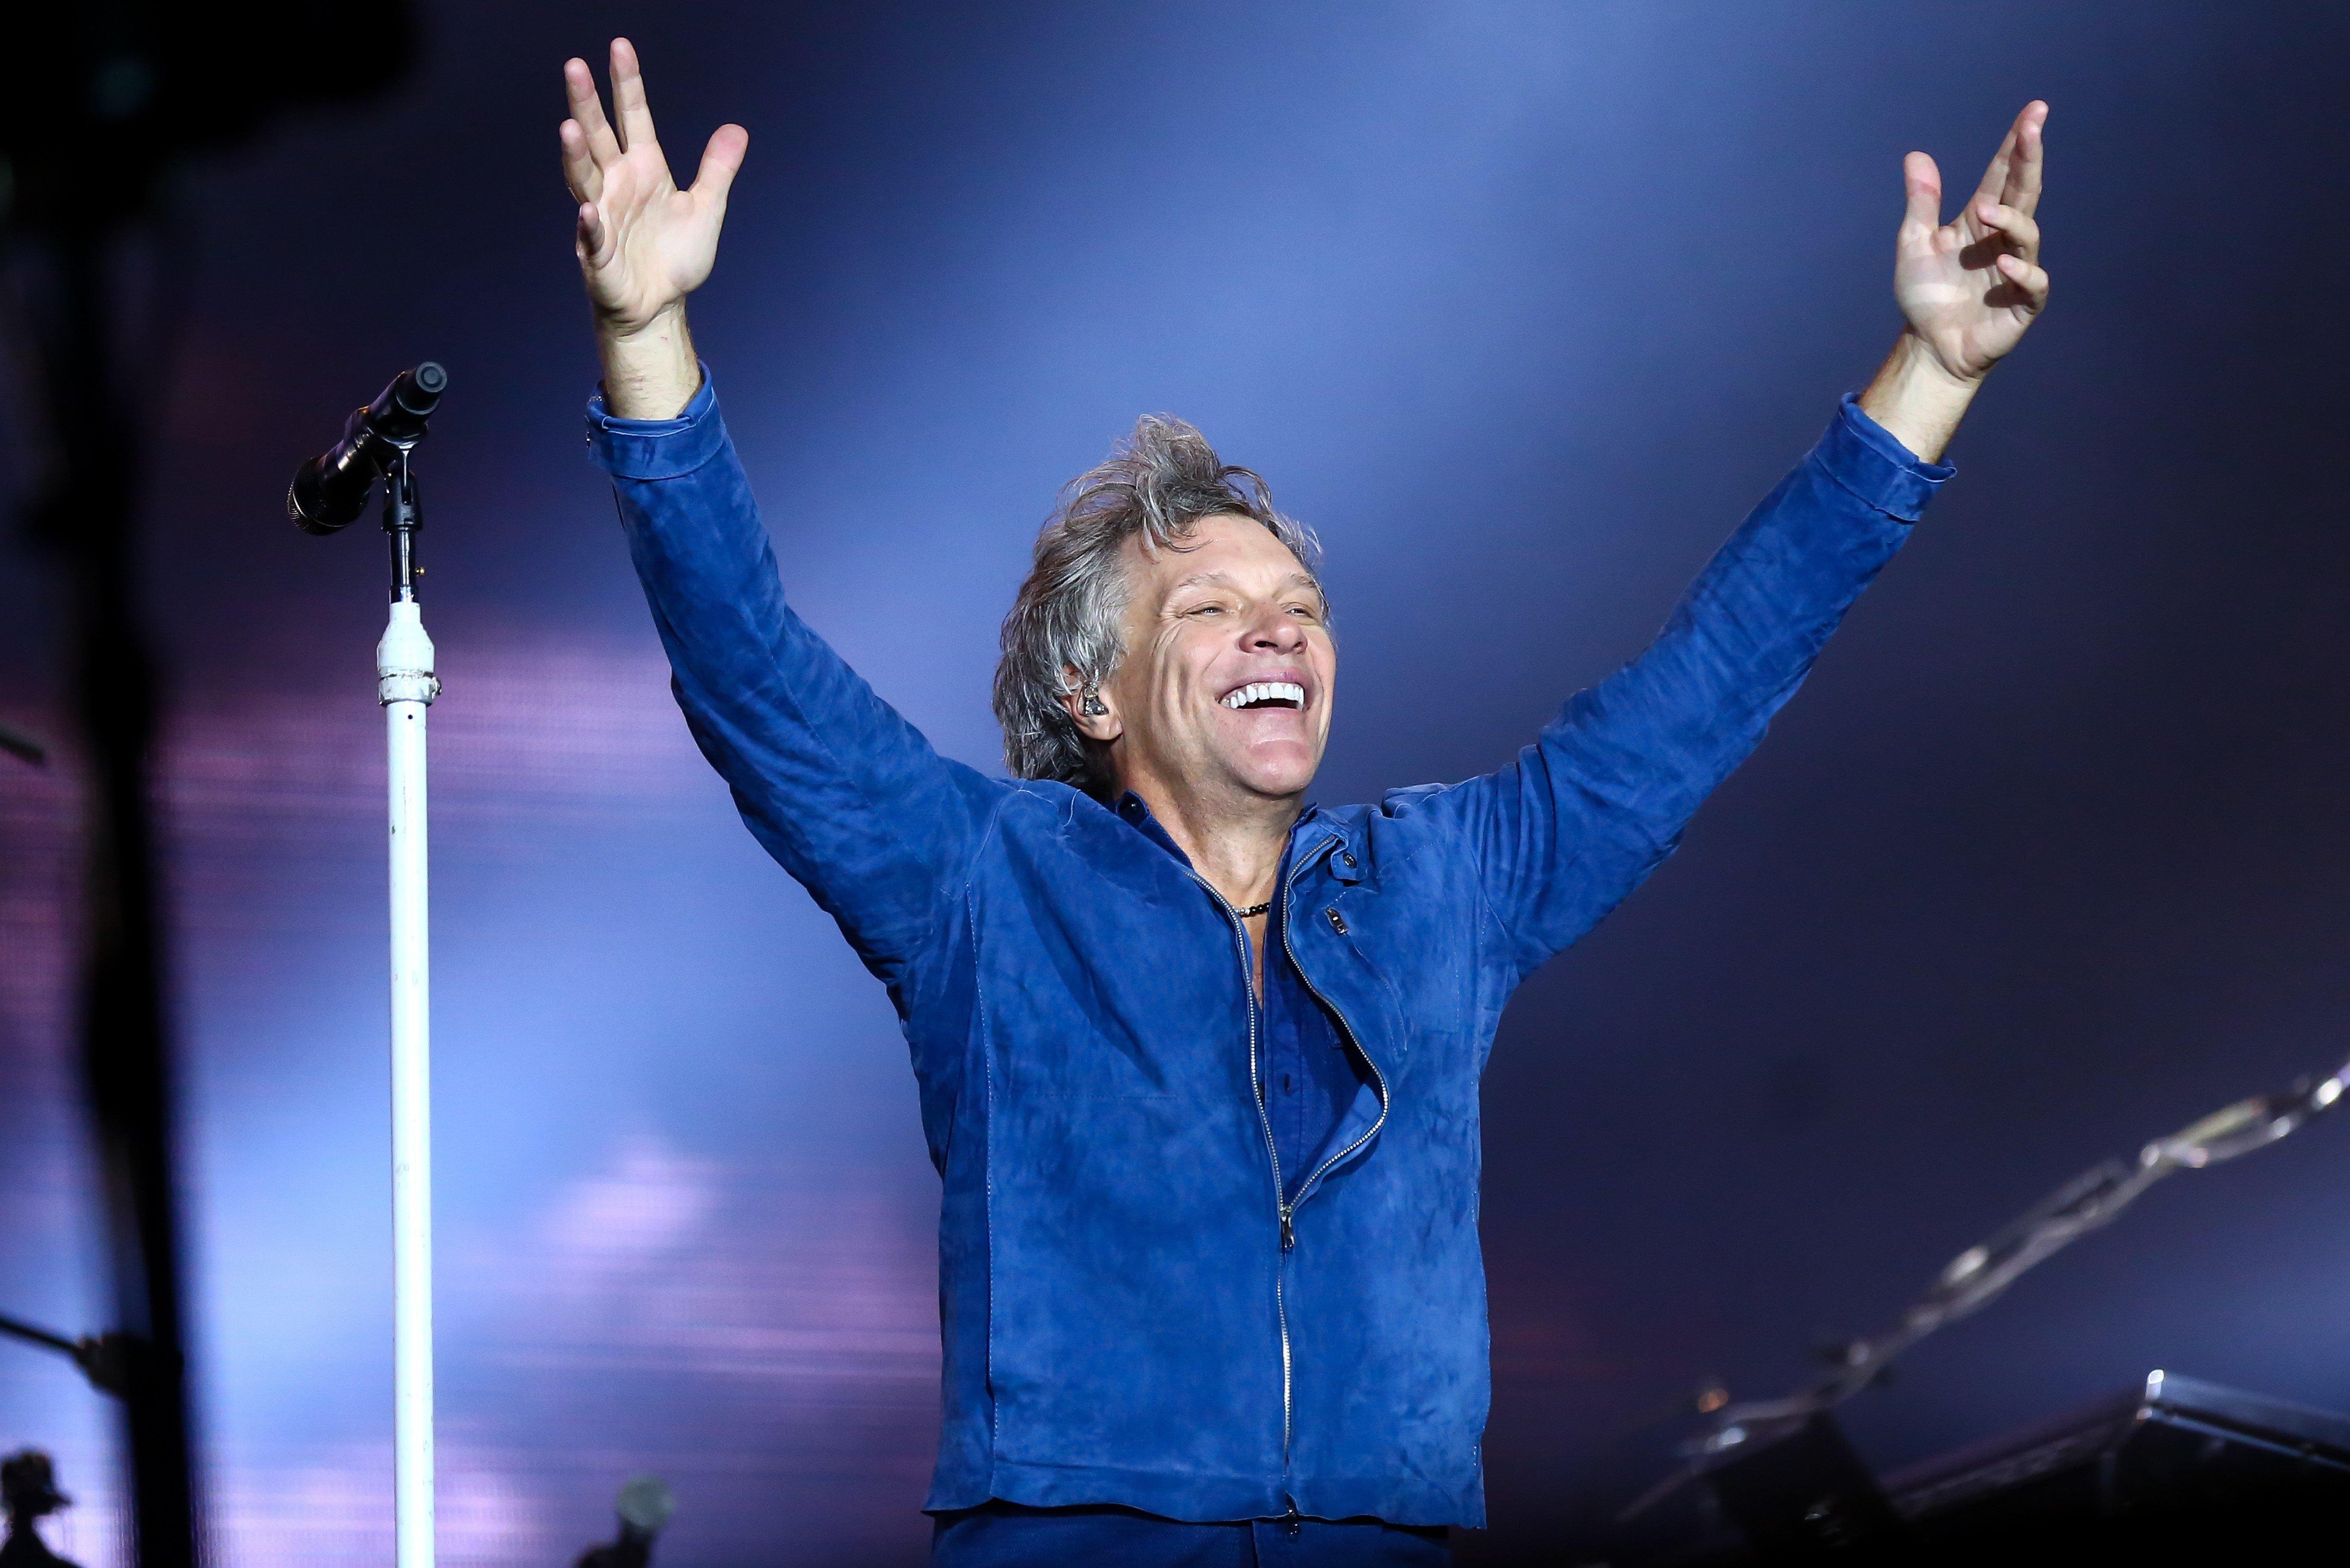 Jon Bon Jovi, the leader of Bon Jovi, soaks in the applause during a Sept. 22 concert in Brazil.